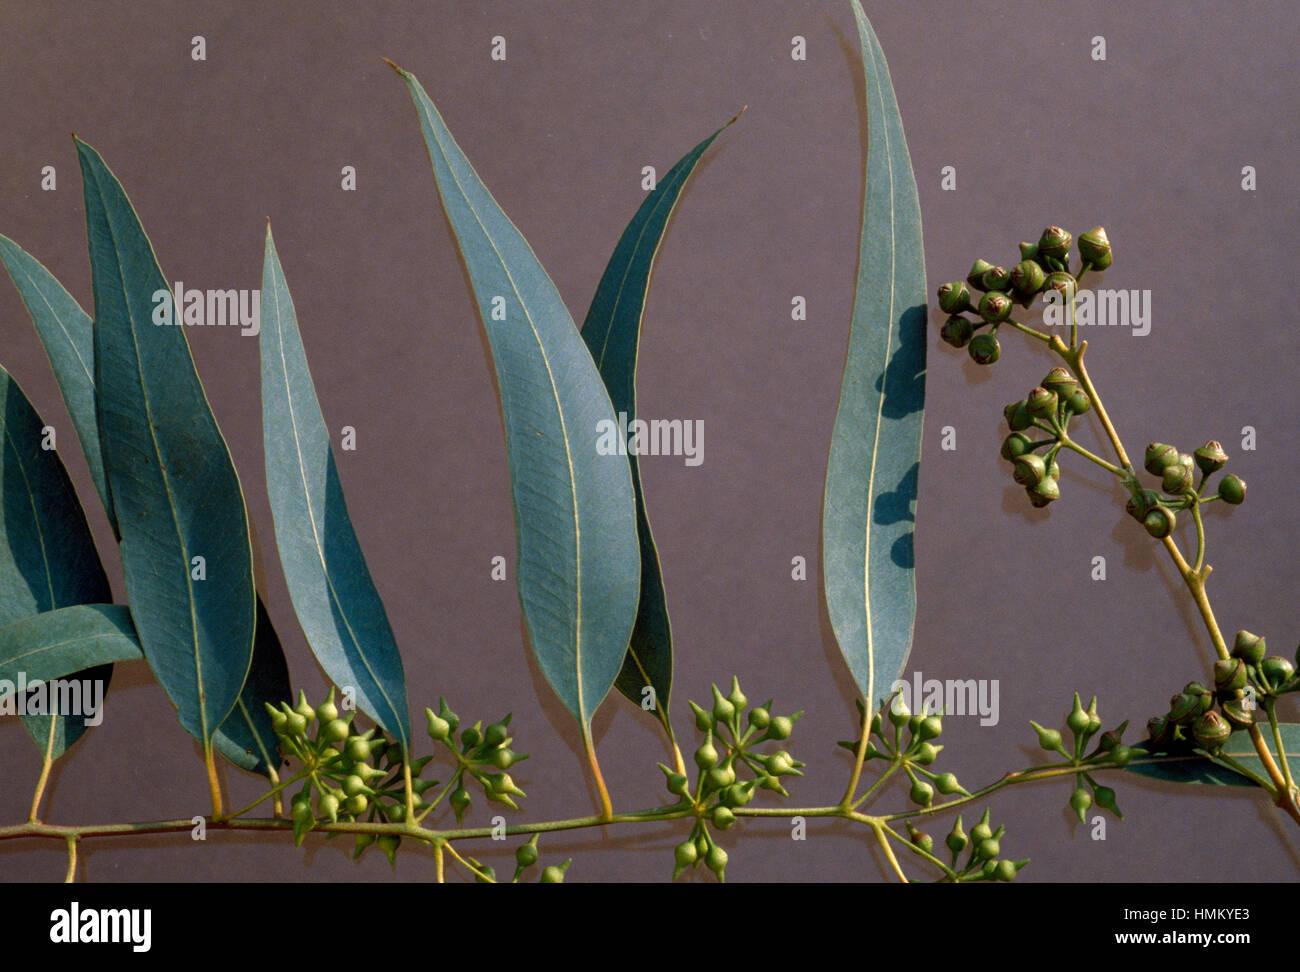 Eucalyptus branch and leaves (Eucalyptus globulus), Myrtaceae. - Stock Image